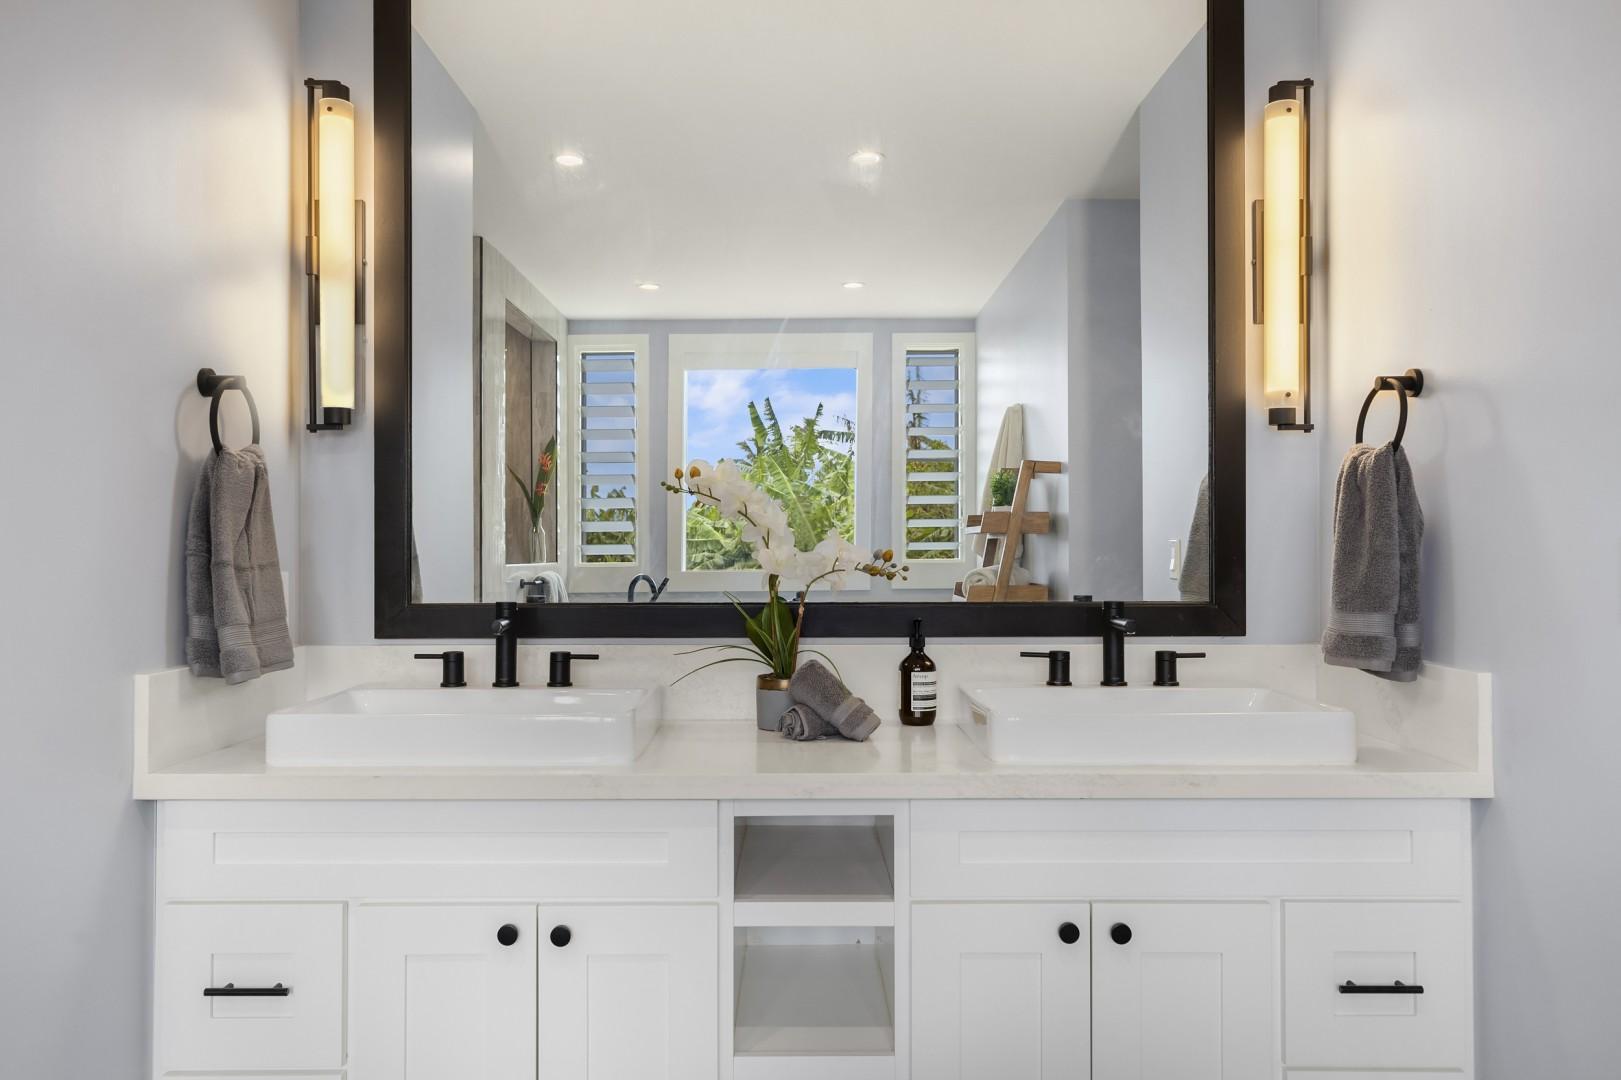 Dual vanity in the Master bath